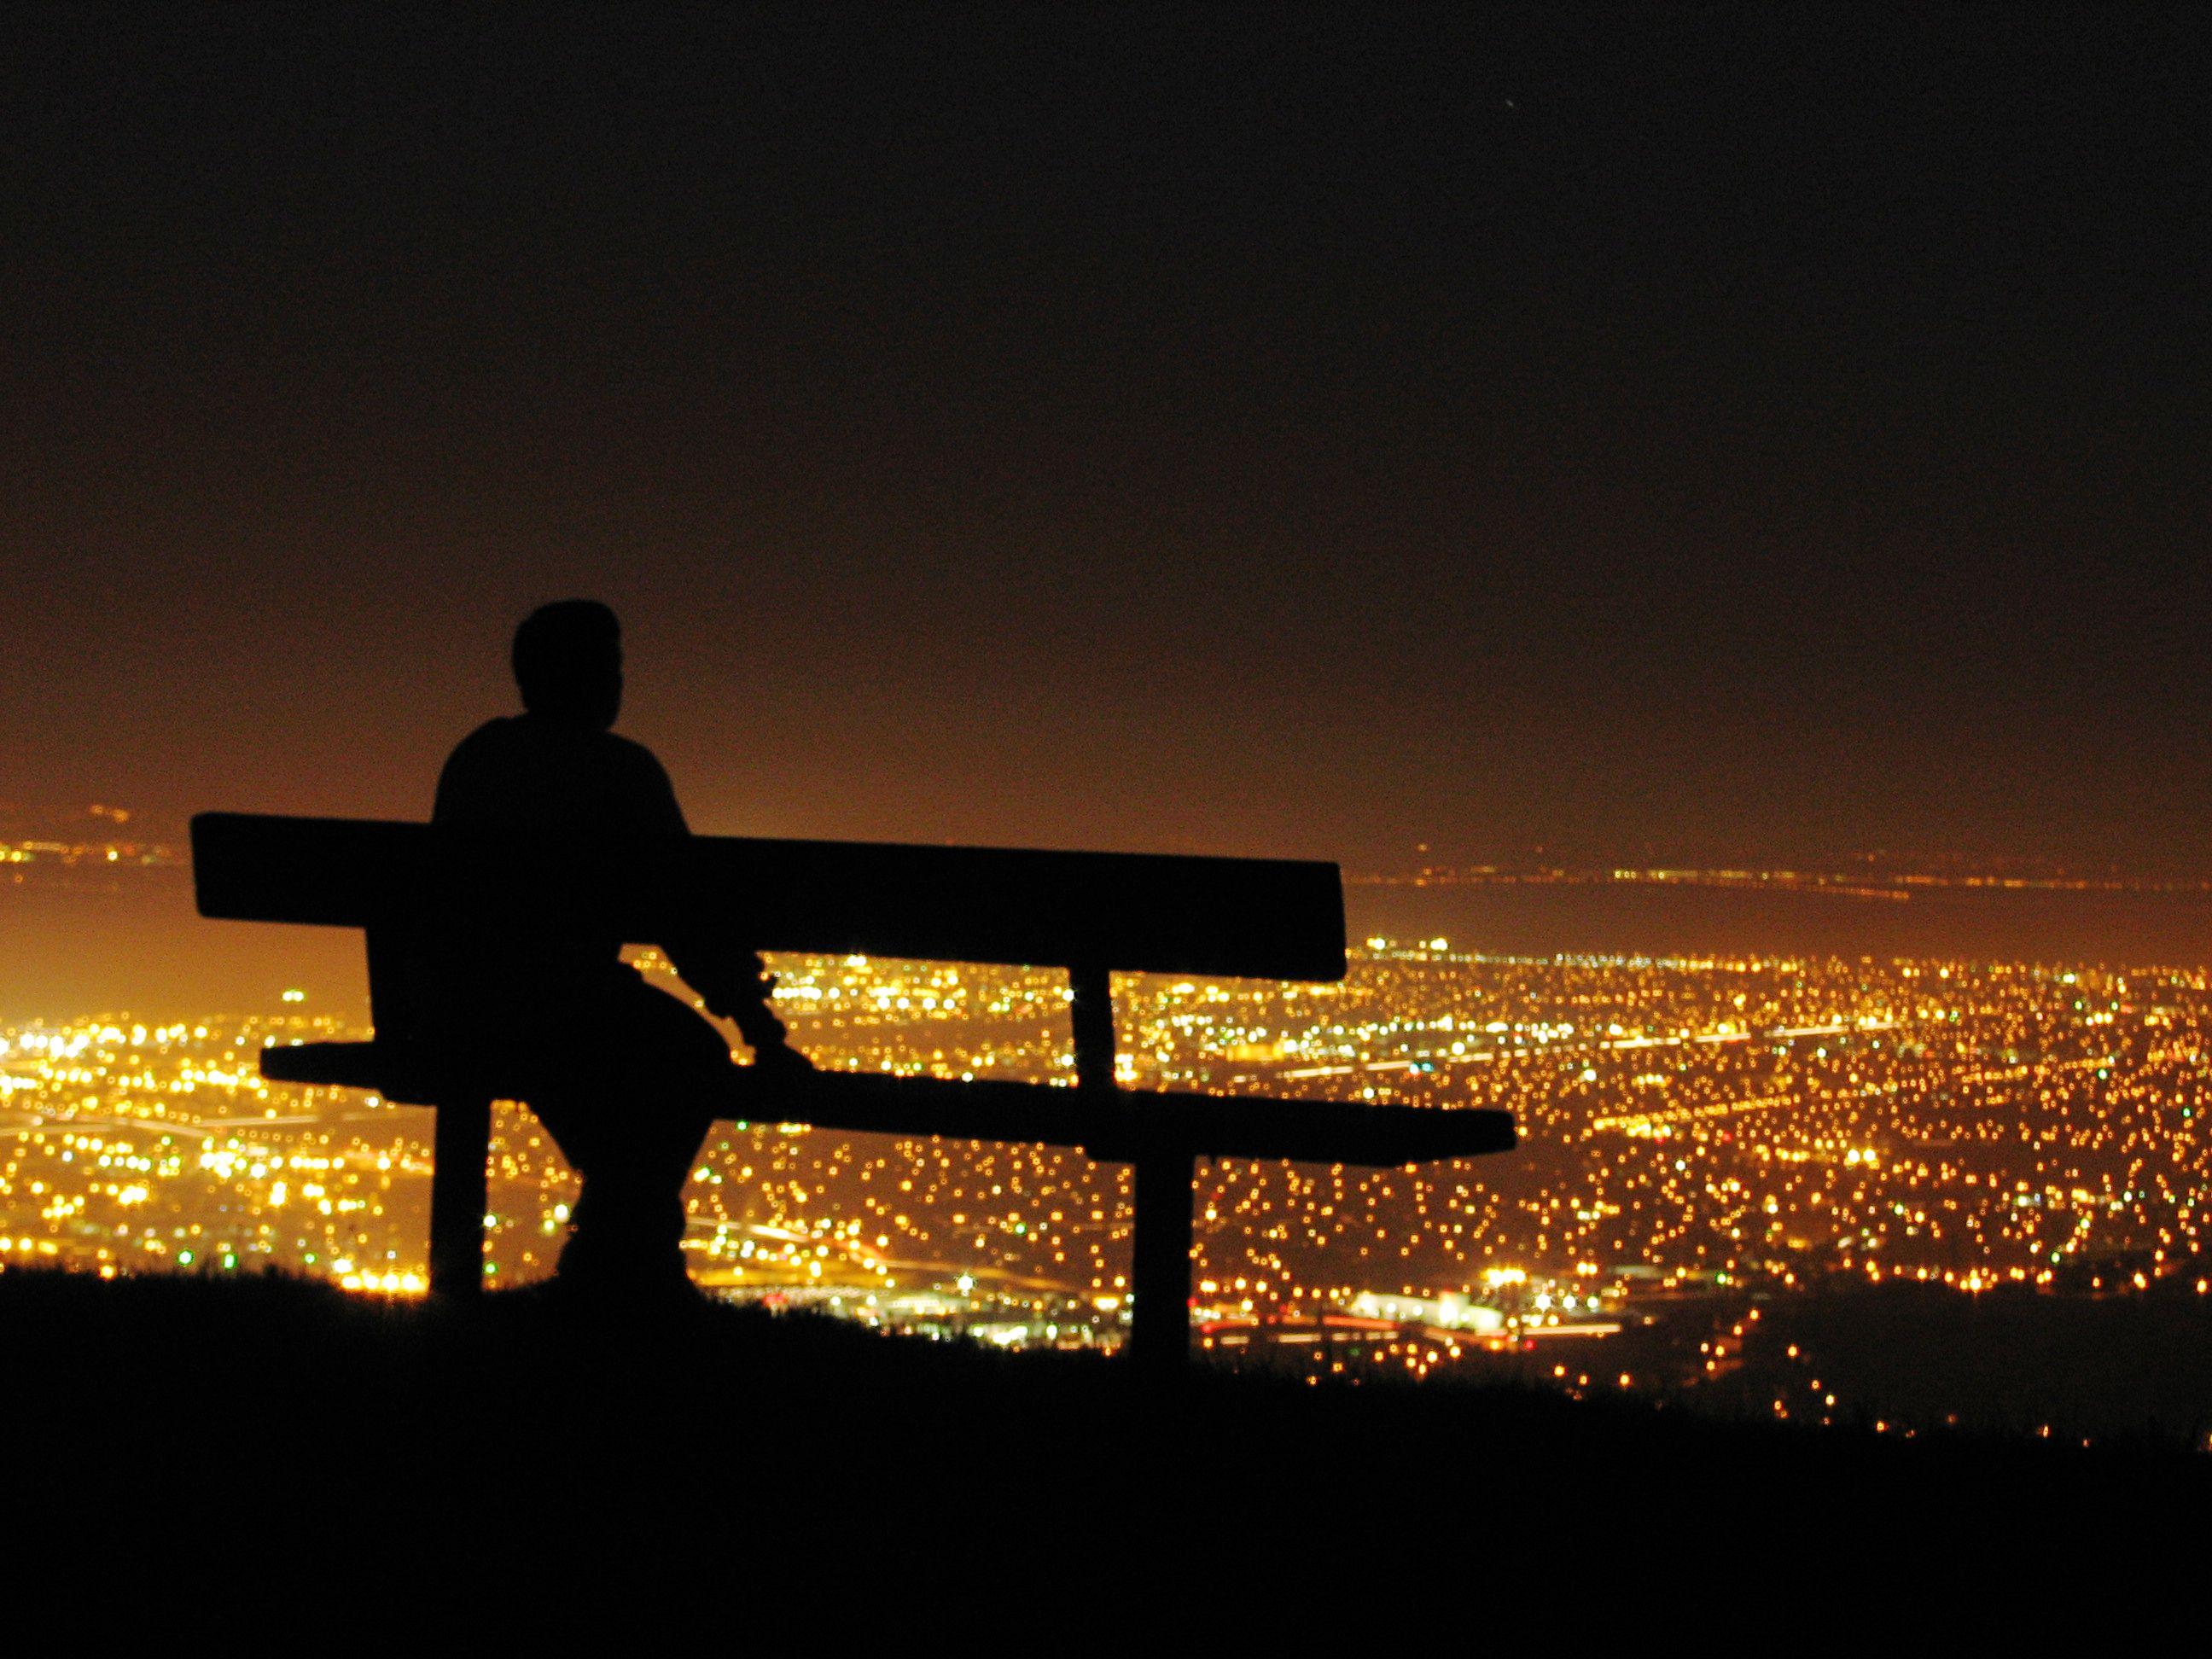 Shores Of Words Tanka City Lights At Night City Photography